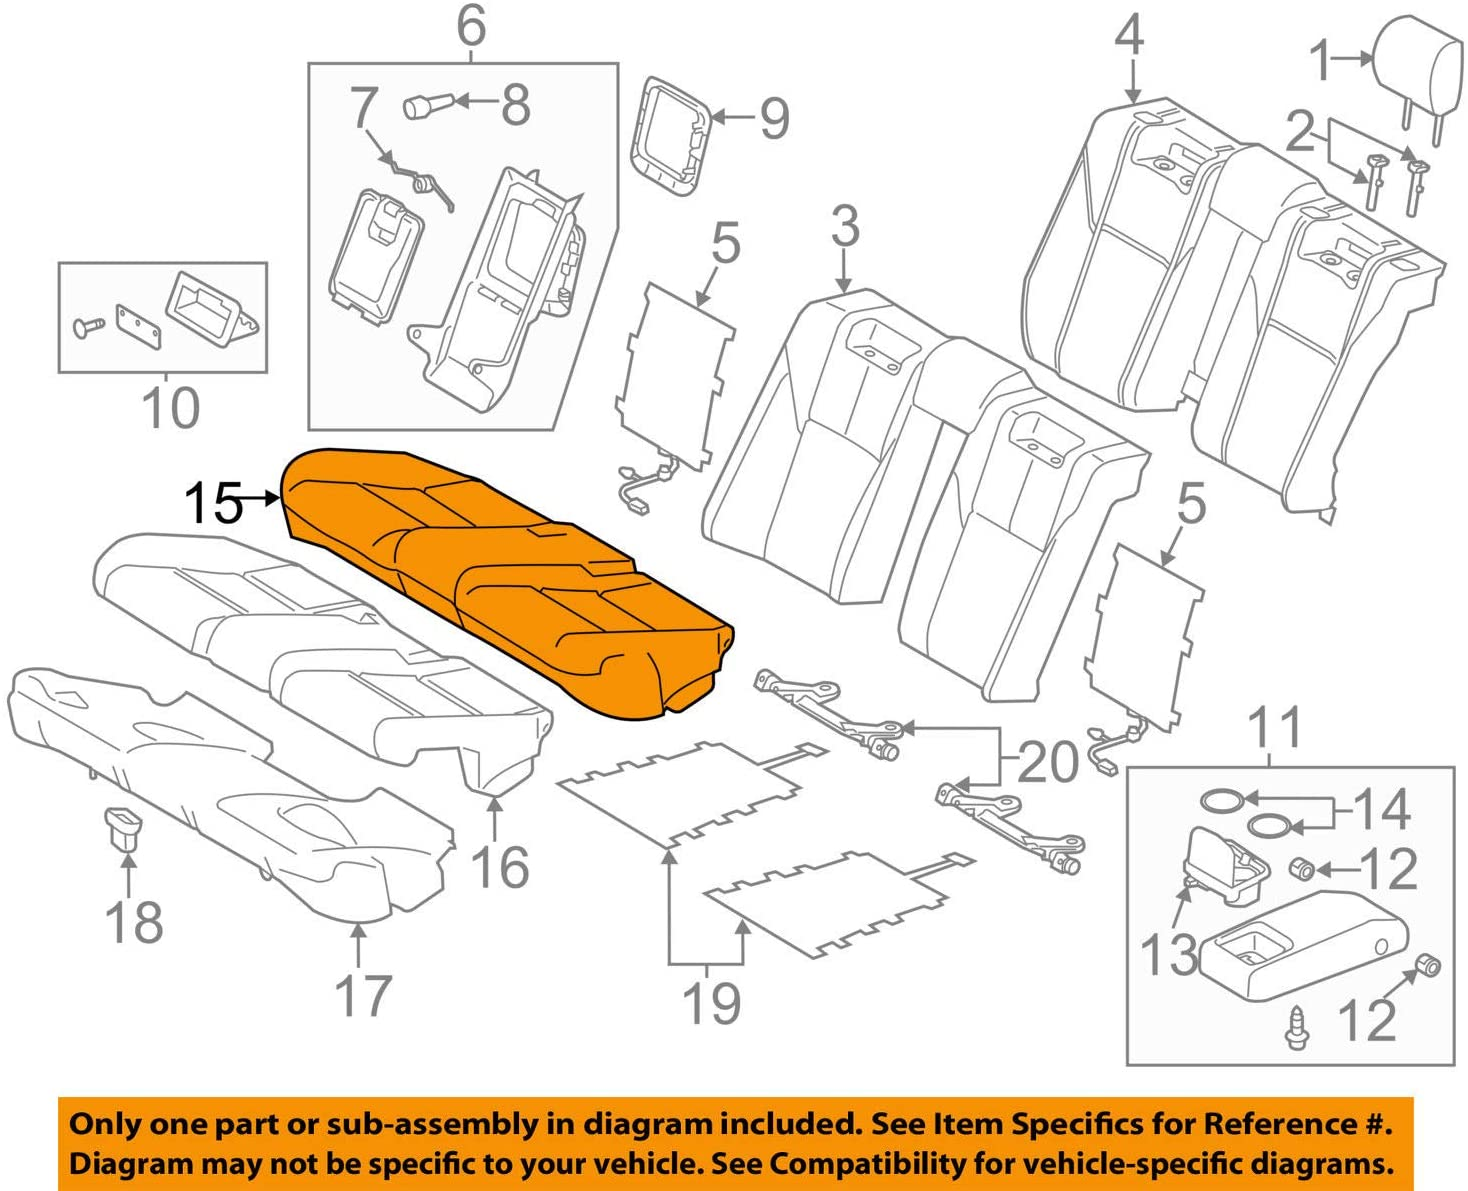 TOYOTA Genuine 71075-07110-C4 Seat Cushion Cover